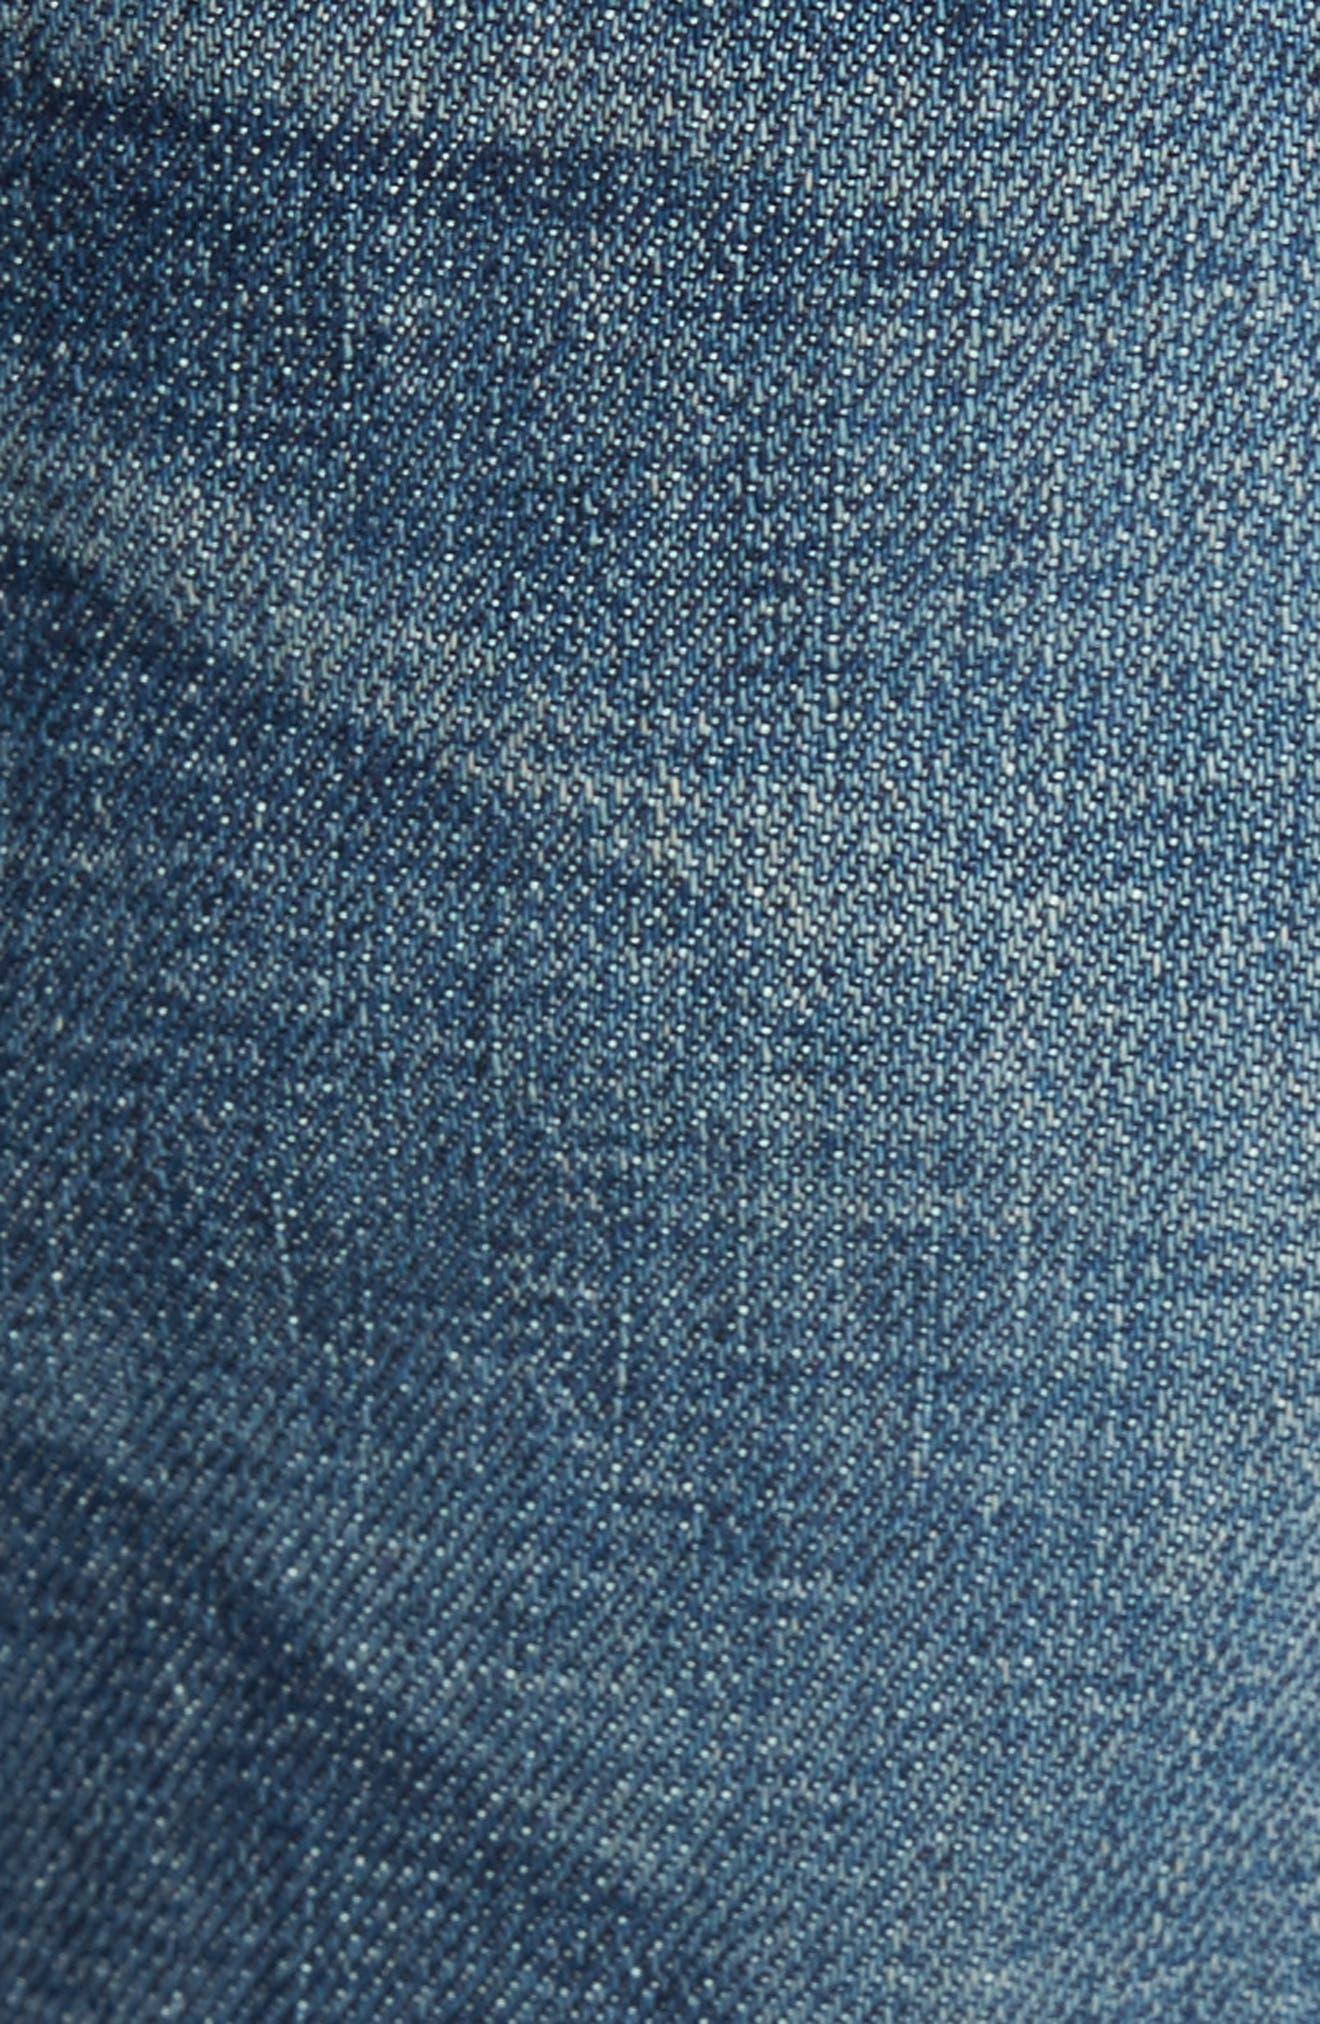 Alternate Image 5  - Hudson Jeans Blake Slim Fit Jeans (Scribe)